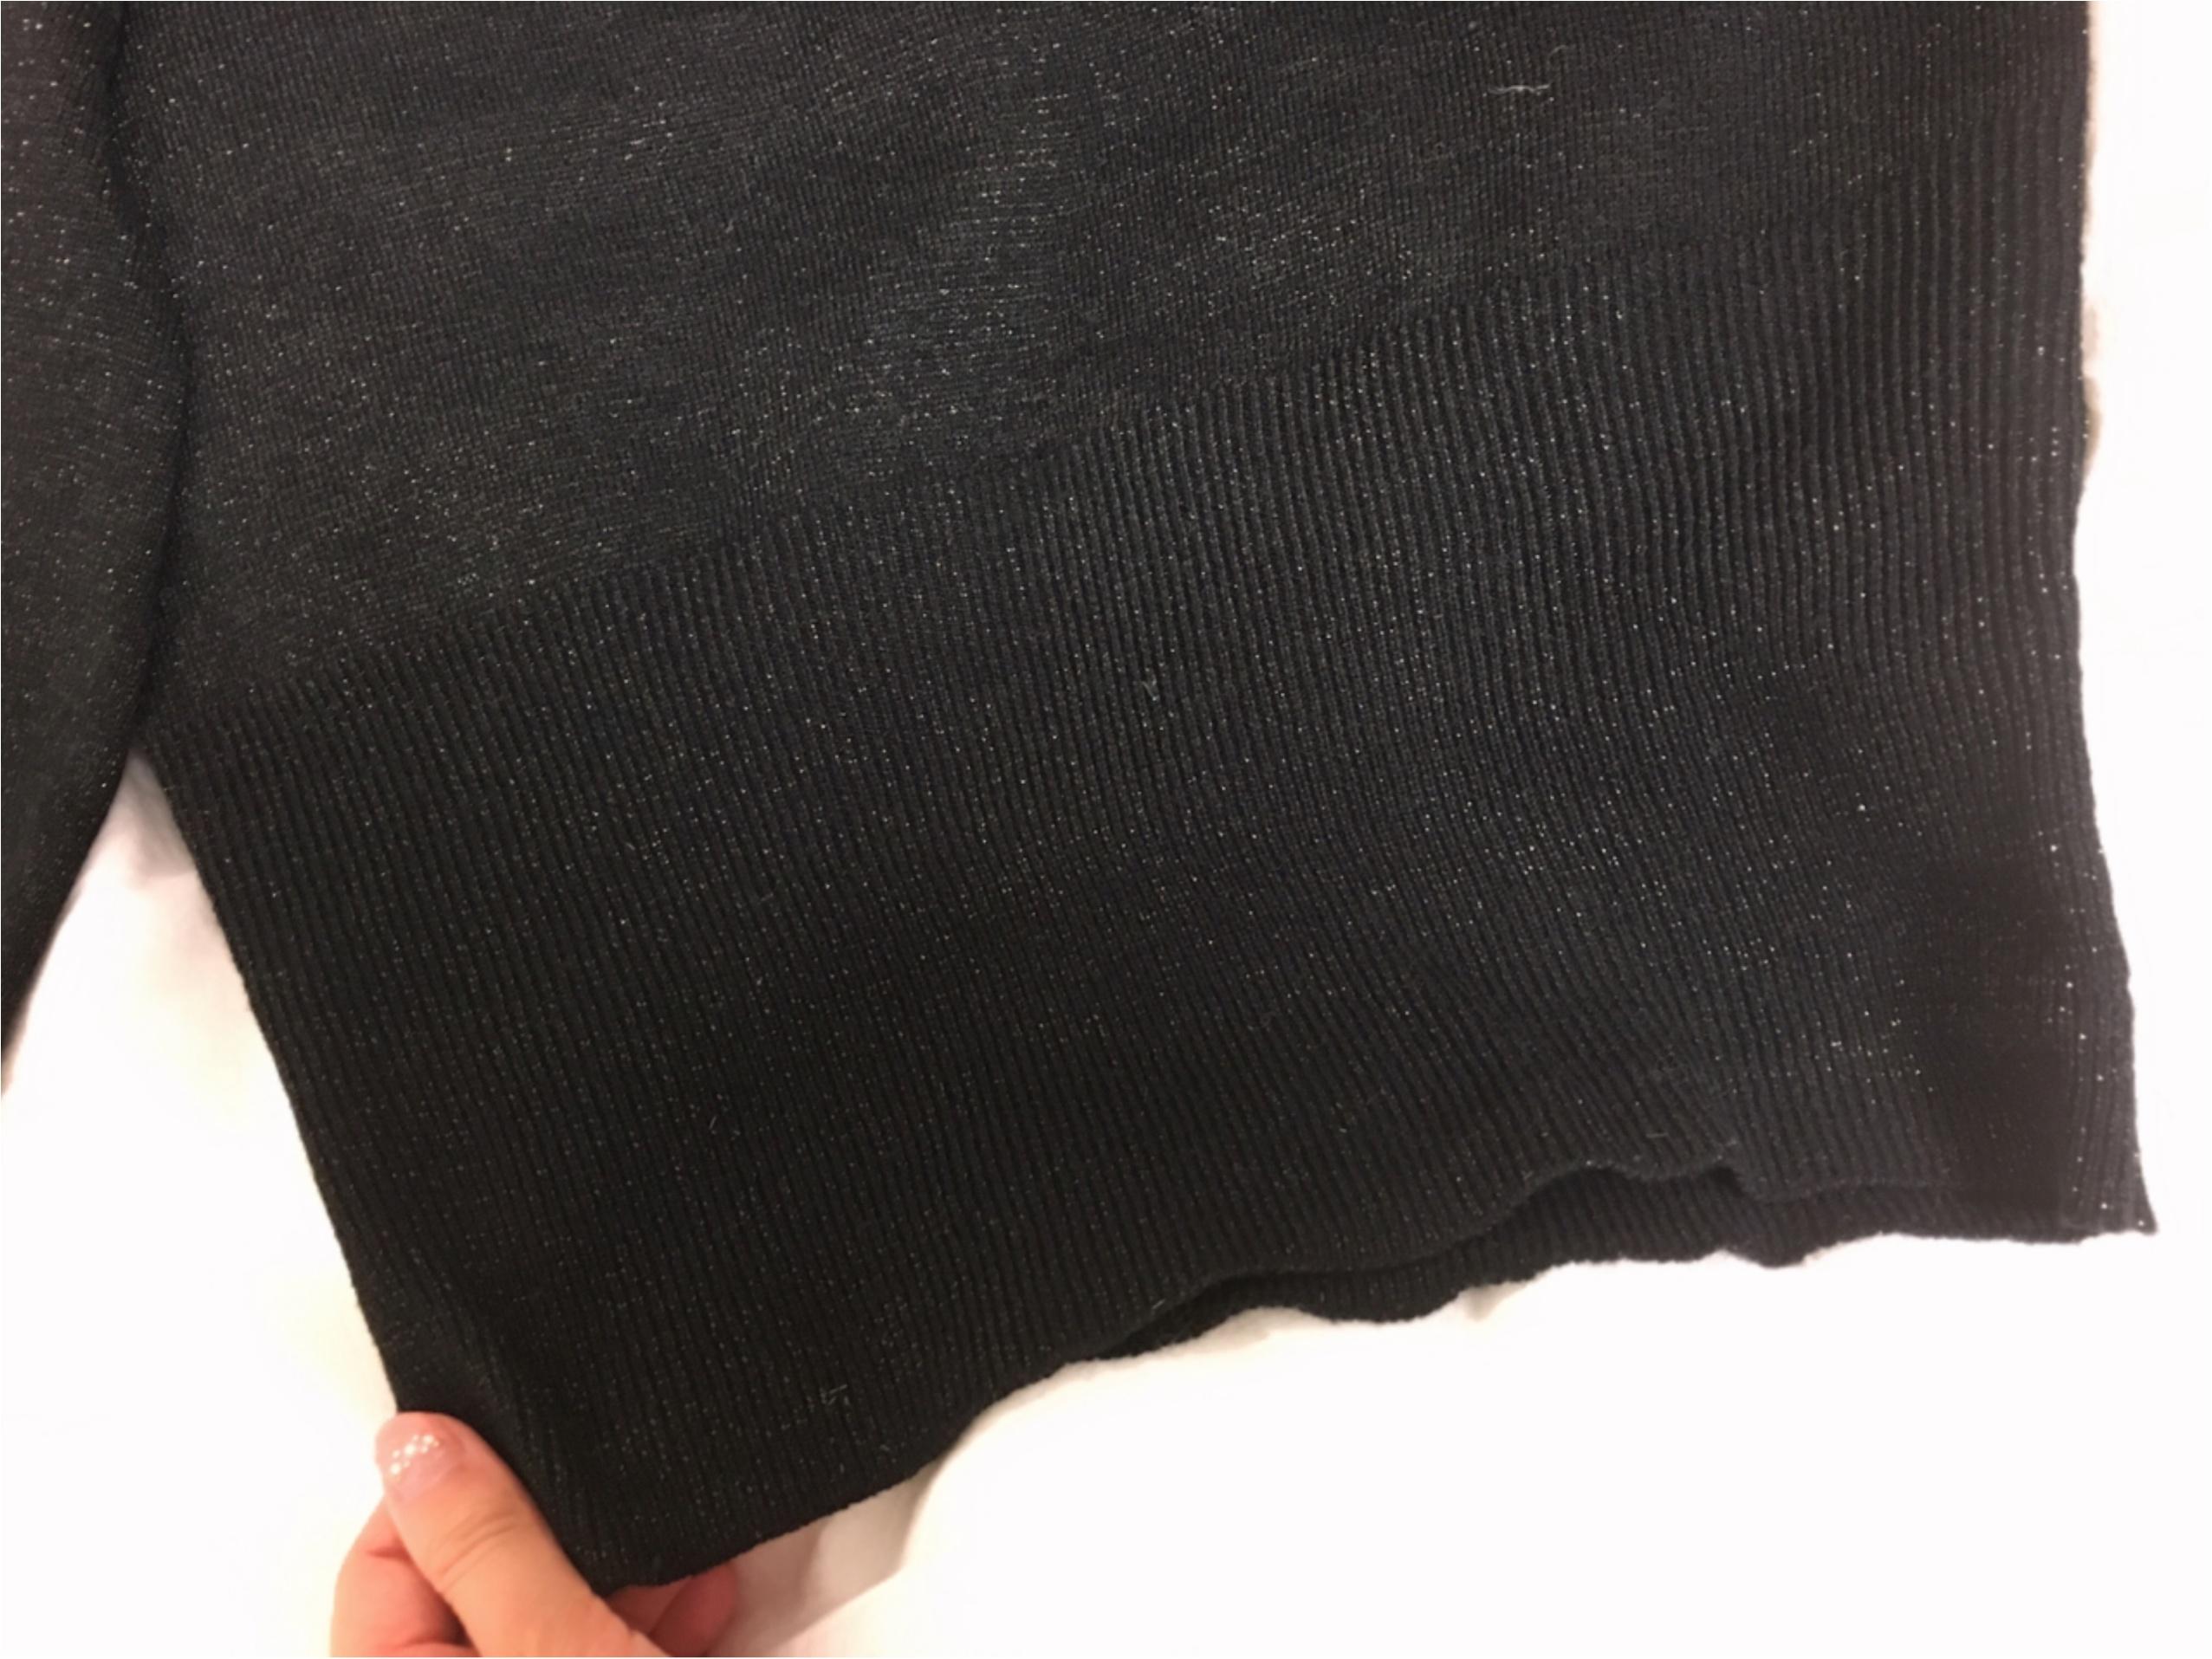 【GU】『ラメパフスリーブセーター』は、あまり取り上げられていない隠れヒット服!_5